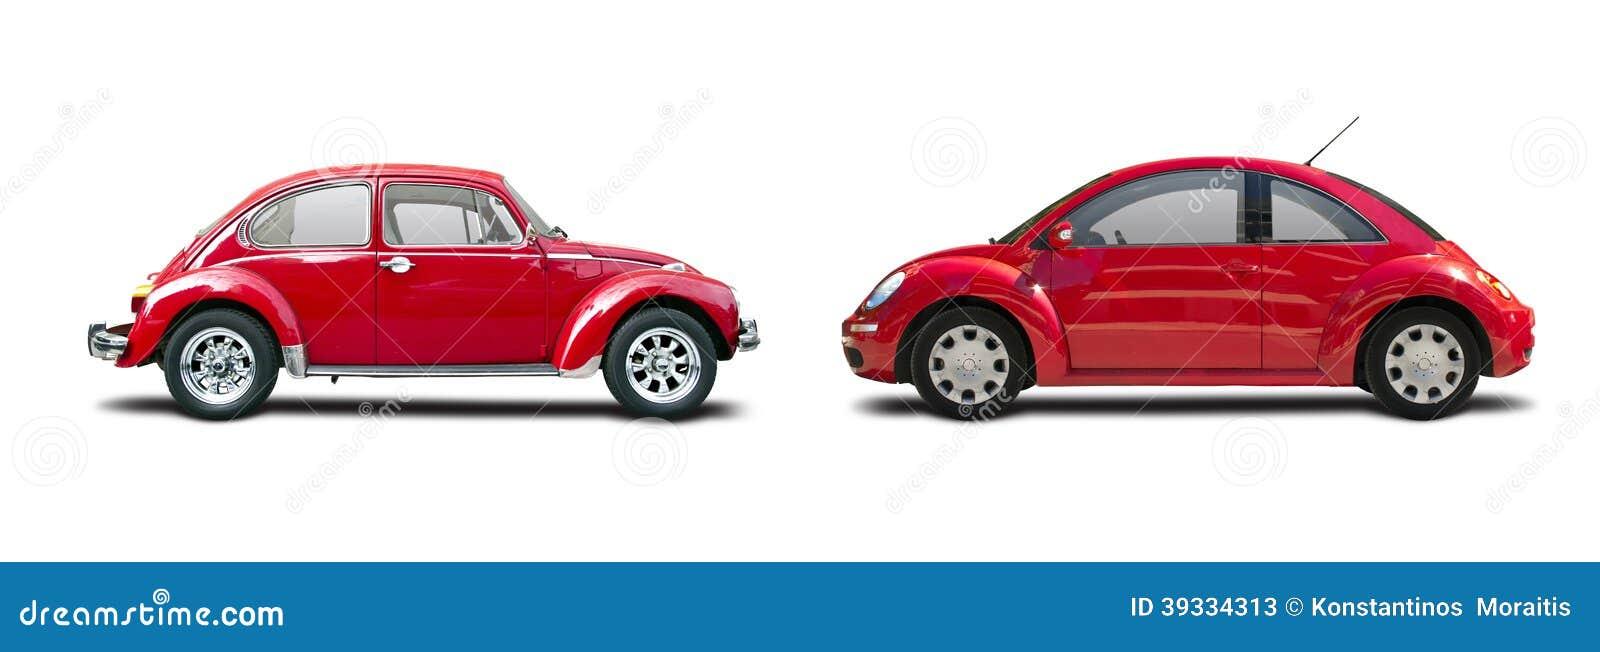 classic car vs new car stock photo image 39334313. Black Bedroom Furniture Sets. Home Design Ideas